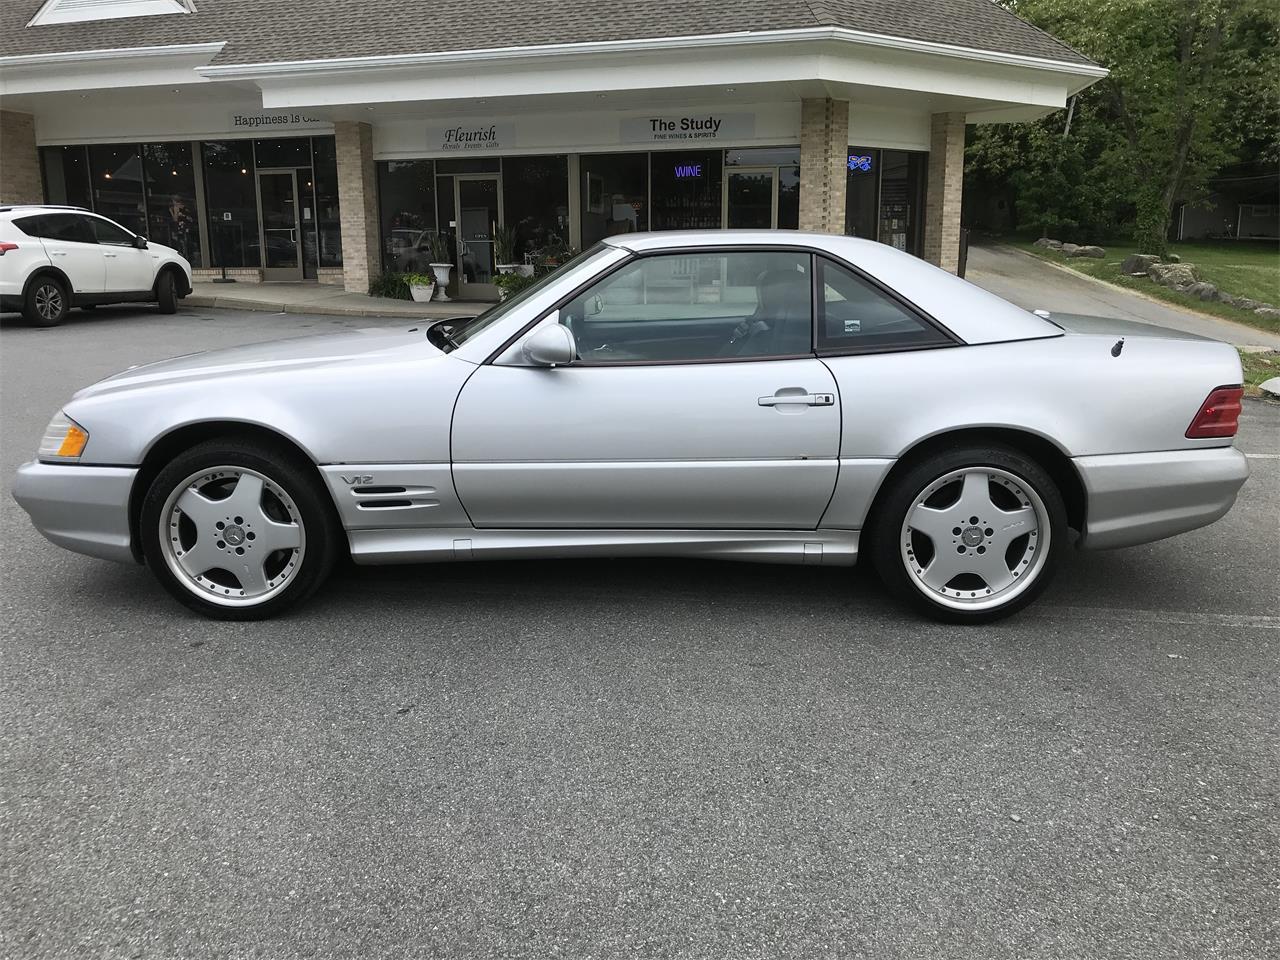 2001 Mercedes-Benz SL600 for Sale | ClassicCars.com | CC ...